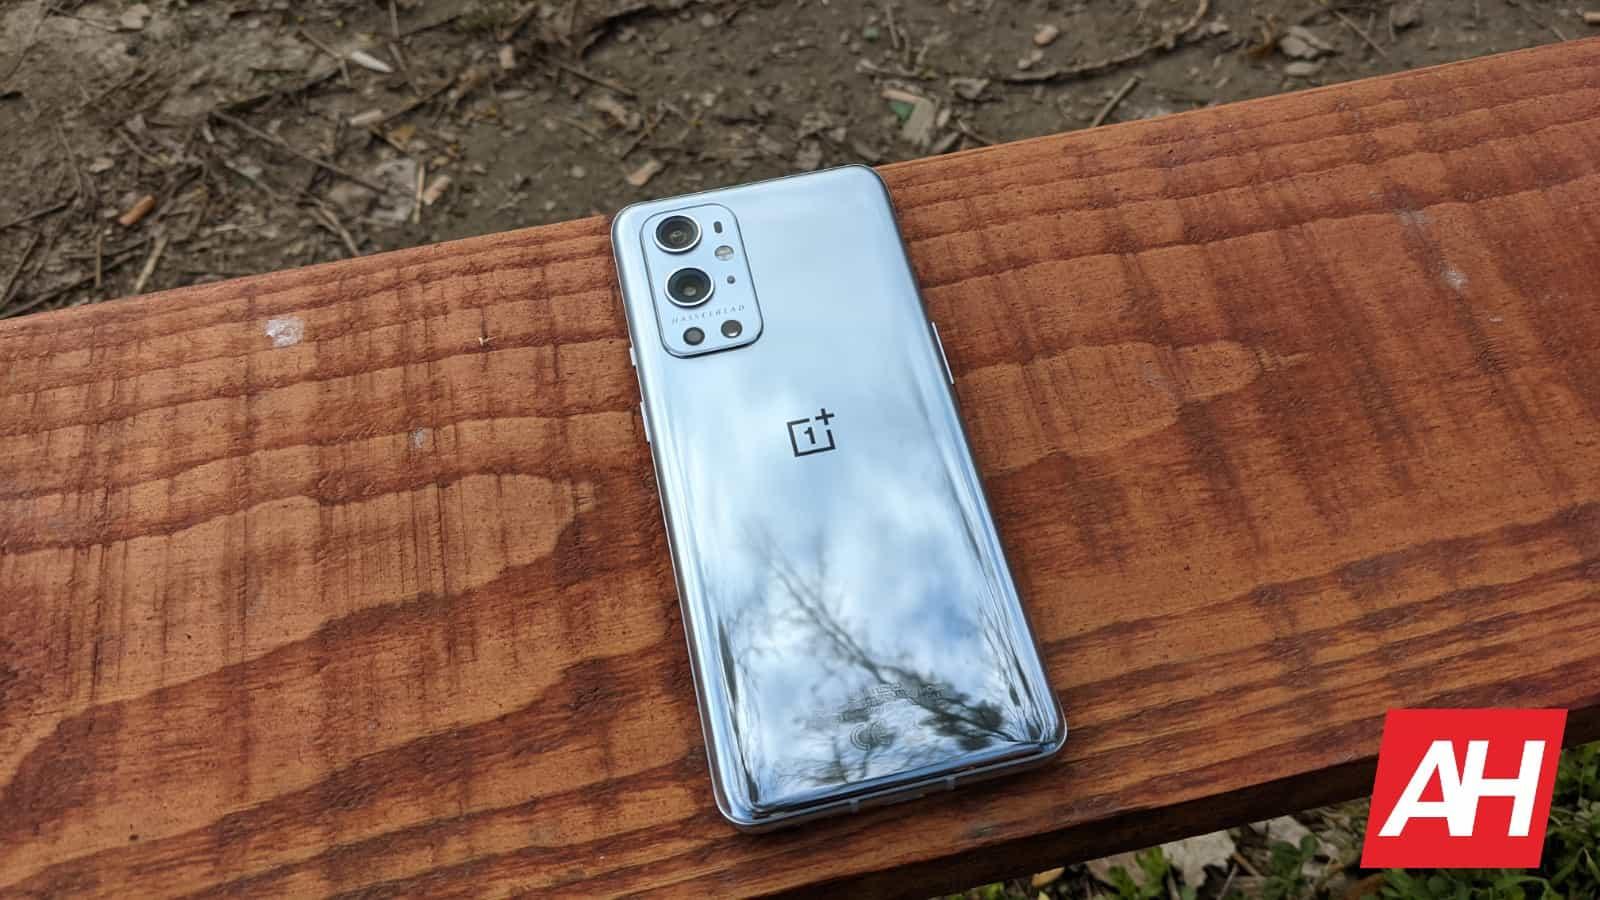 AH OnePlus 9 Pro KL image 8